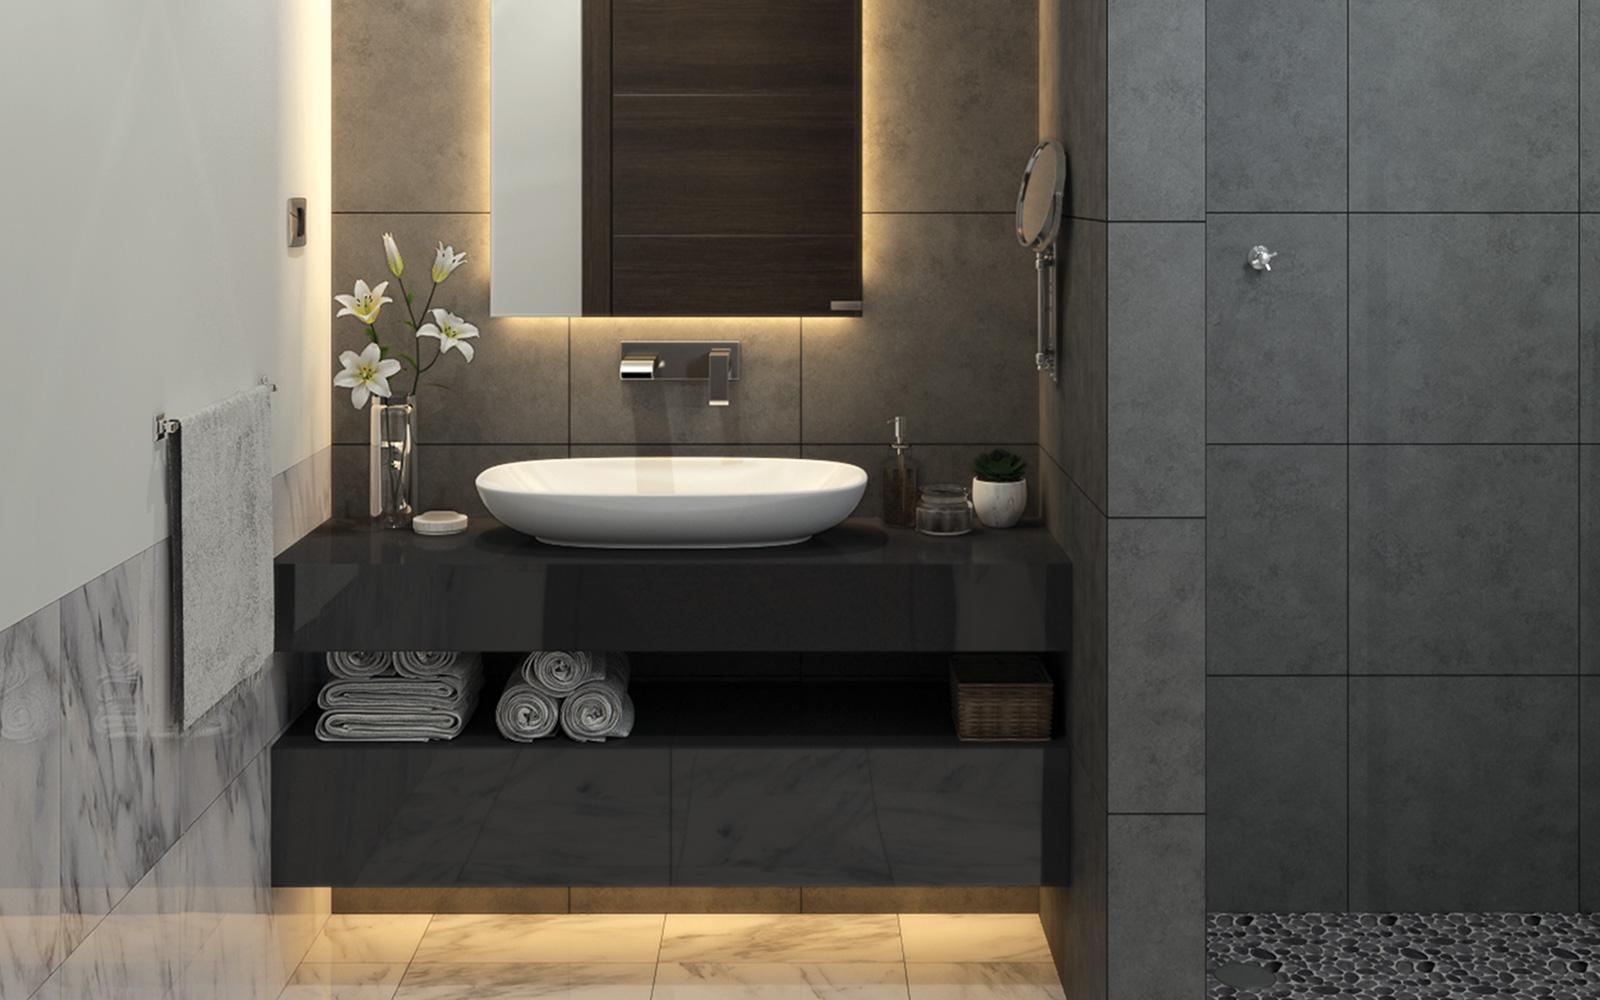 Vogue Design - Nigeria Flats6